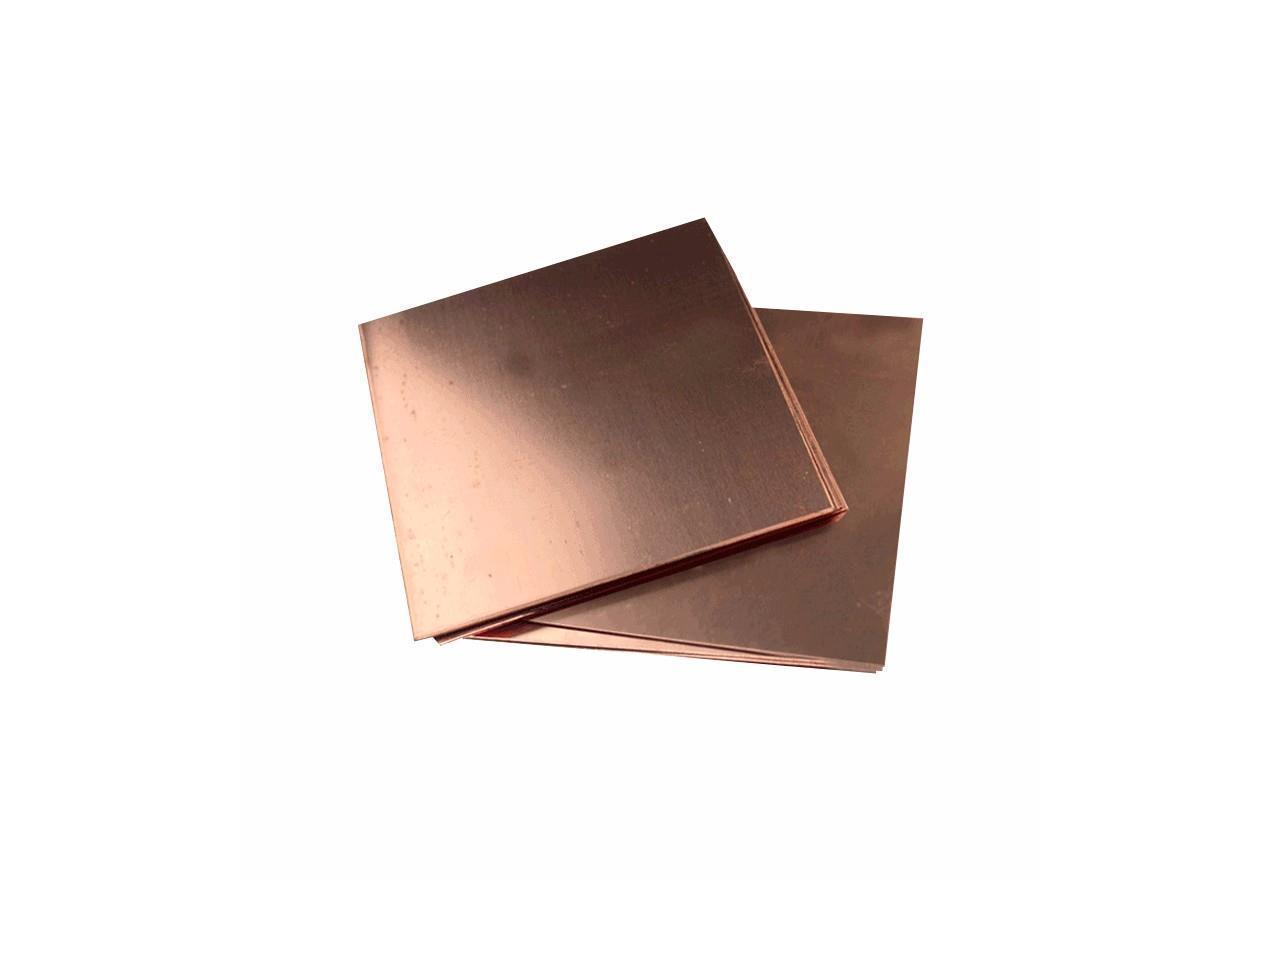 Slim Copper Shim Thermal Cooling Copper Radiator Heatsink for PC RAM CPU